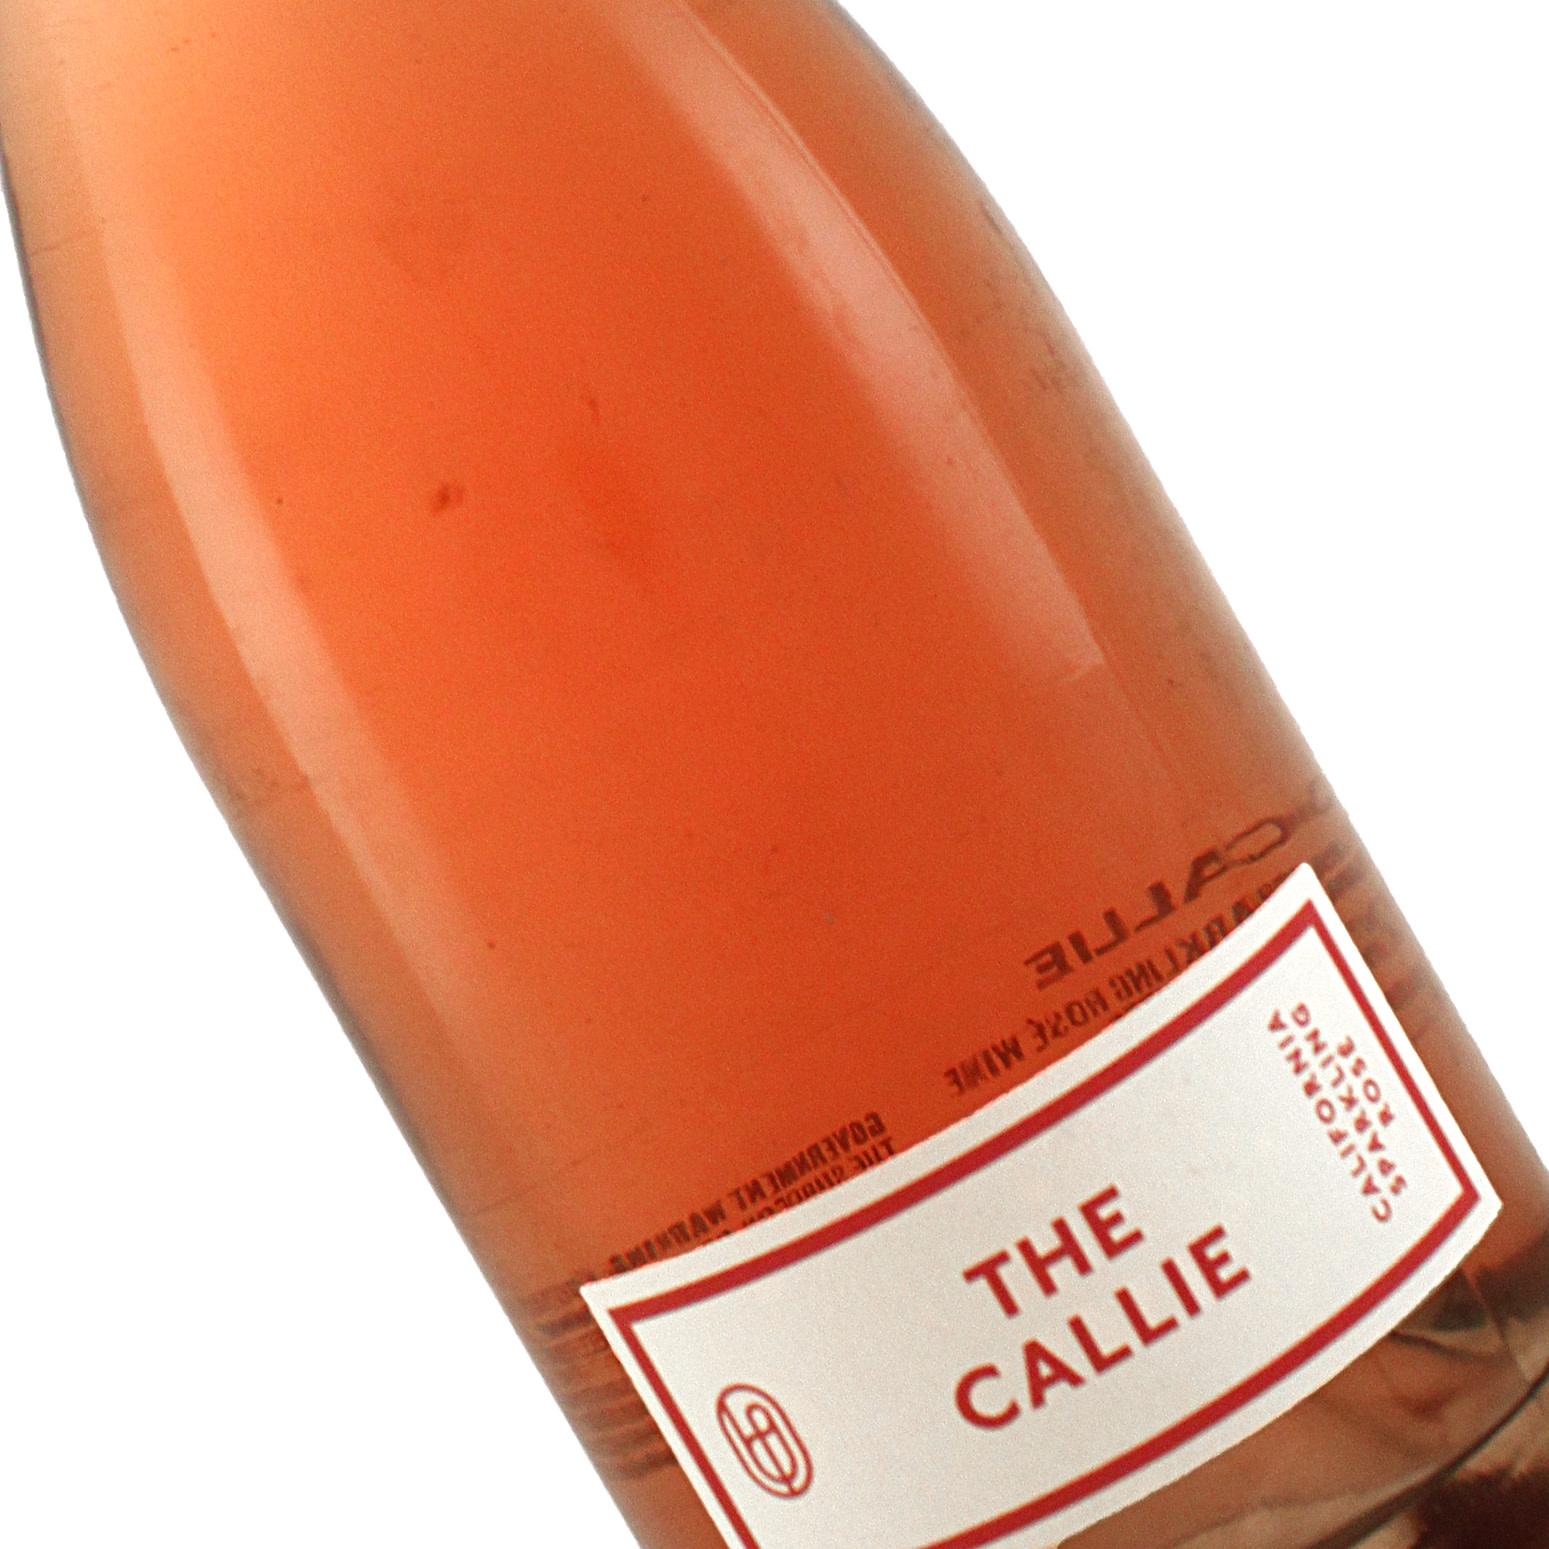 "Une Femme N.V. ""The Callie"" Brut Rose California Sparkling Wine"